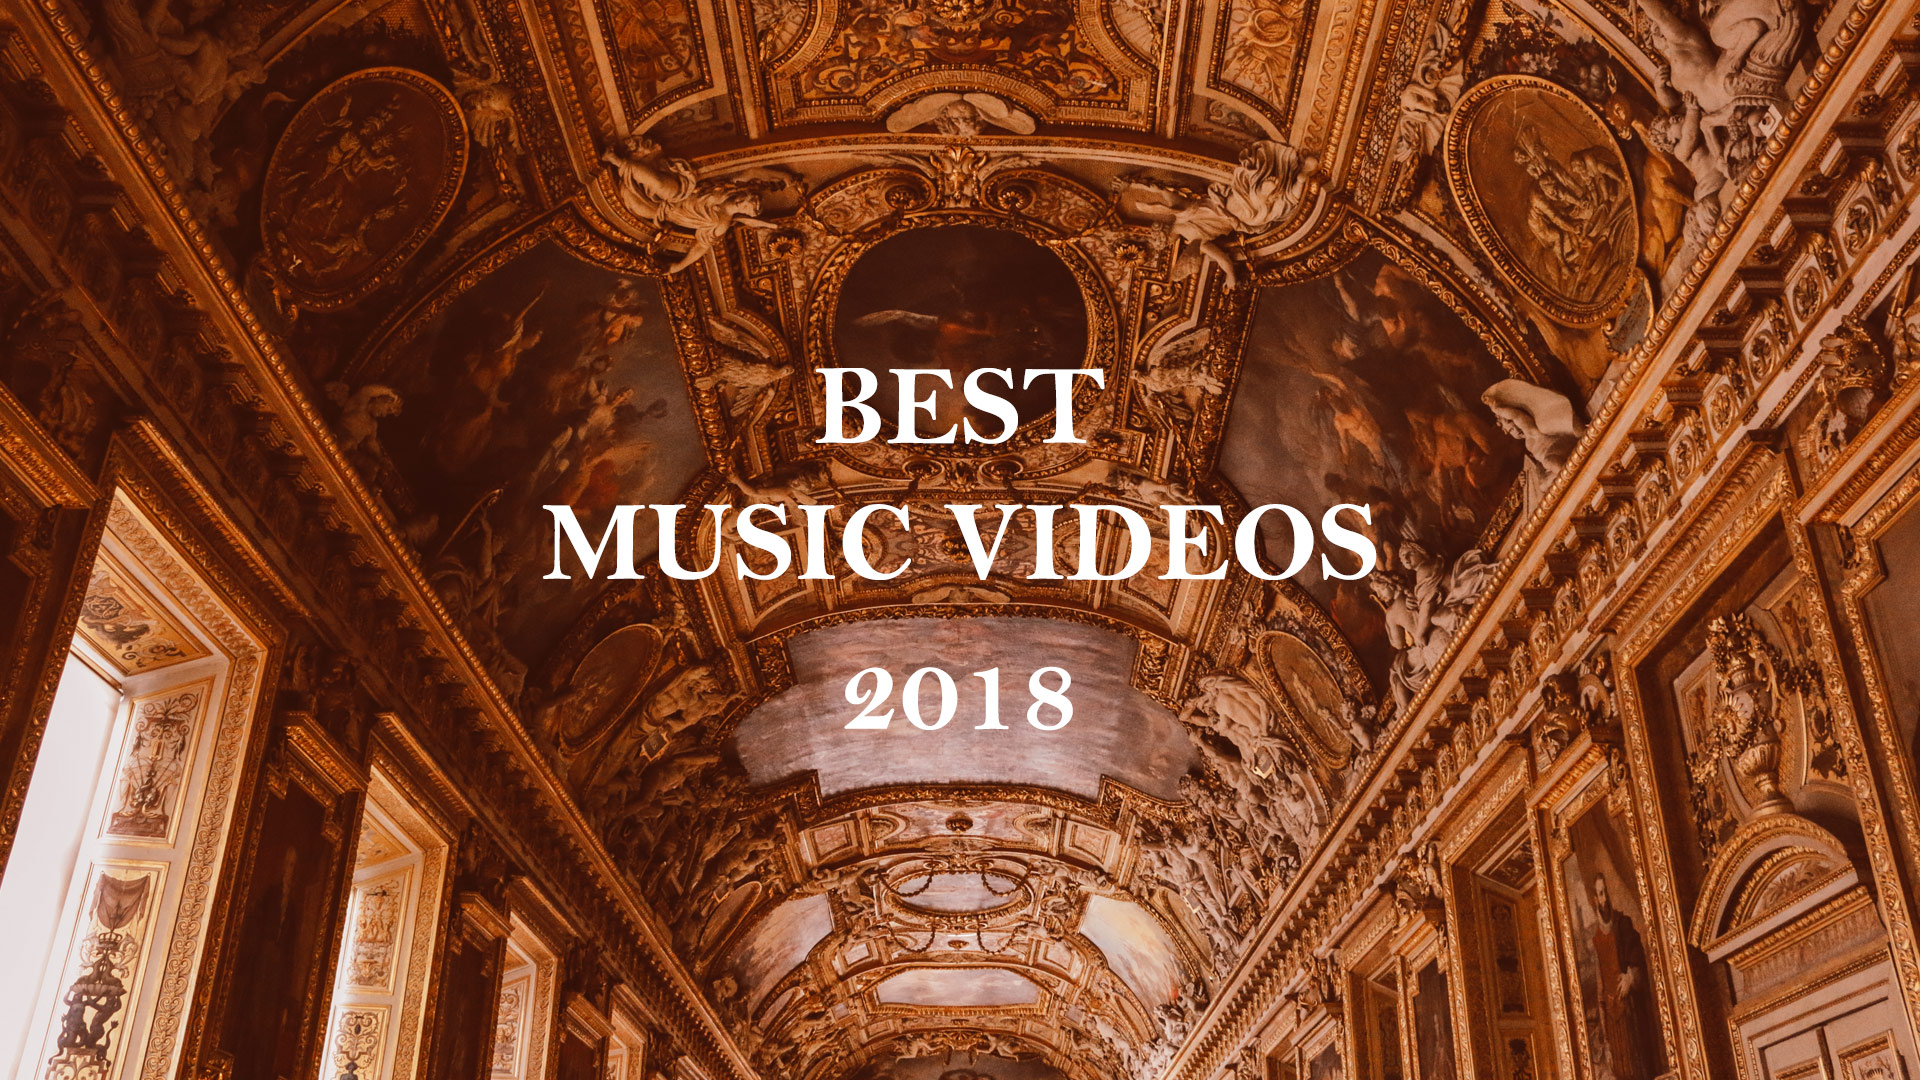 Best music videos of 2018